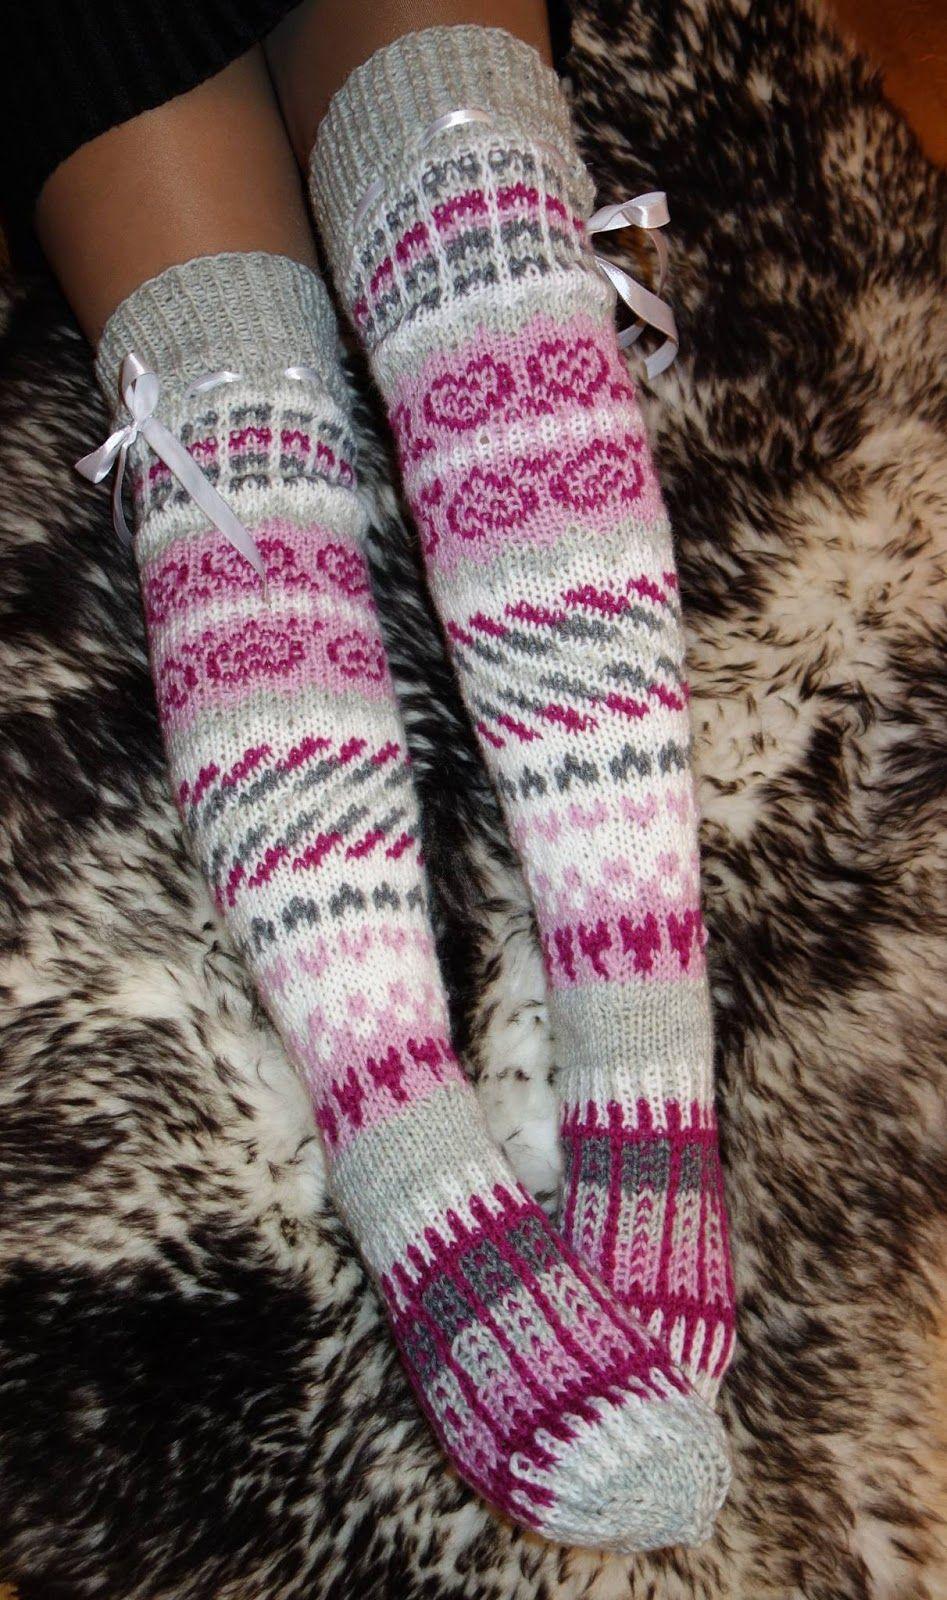 anelma kervinen google search anelmaiset sock pattern by anelma kervinen pinterest. Black Bedroom Furniture Sets. Home Design Ideas